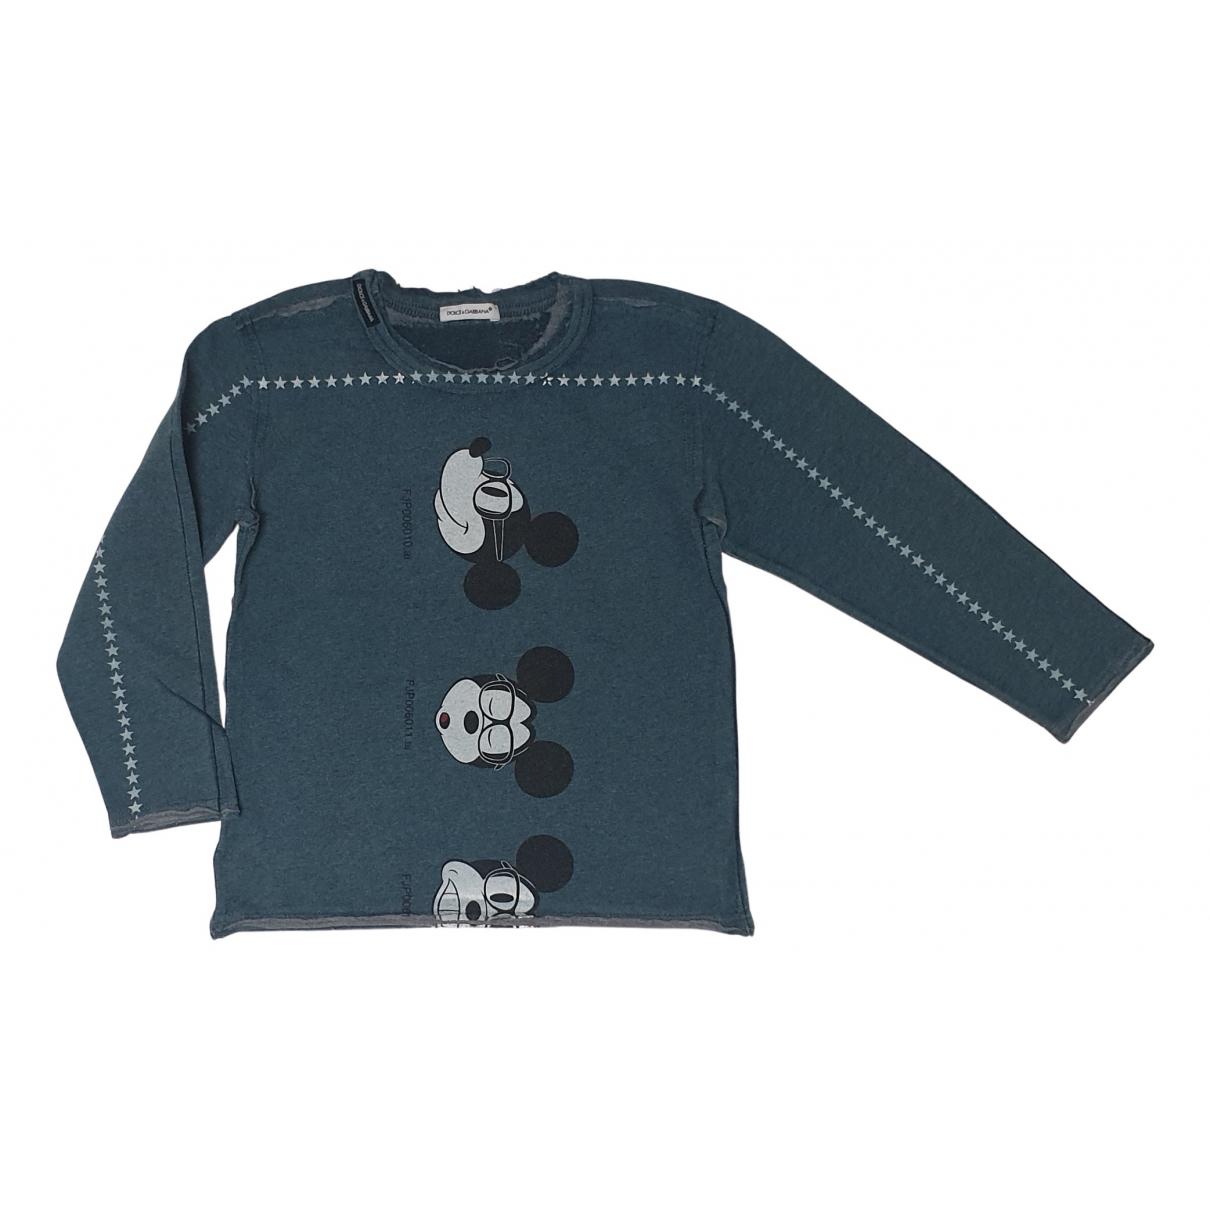 Dolce & Gabbana - Top   pour enfant en coton - bleu